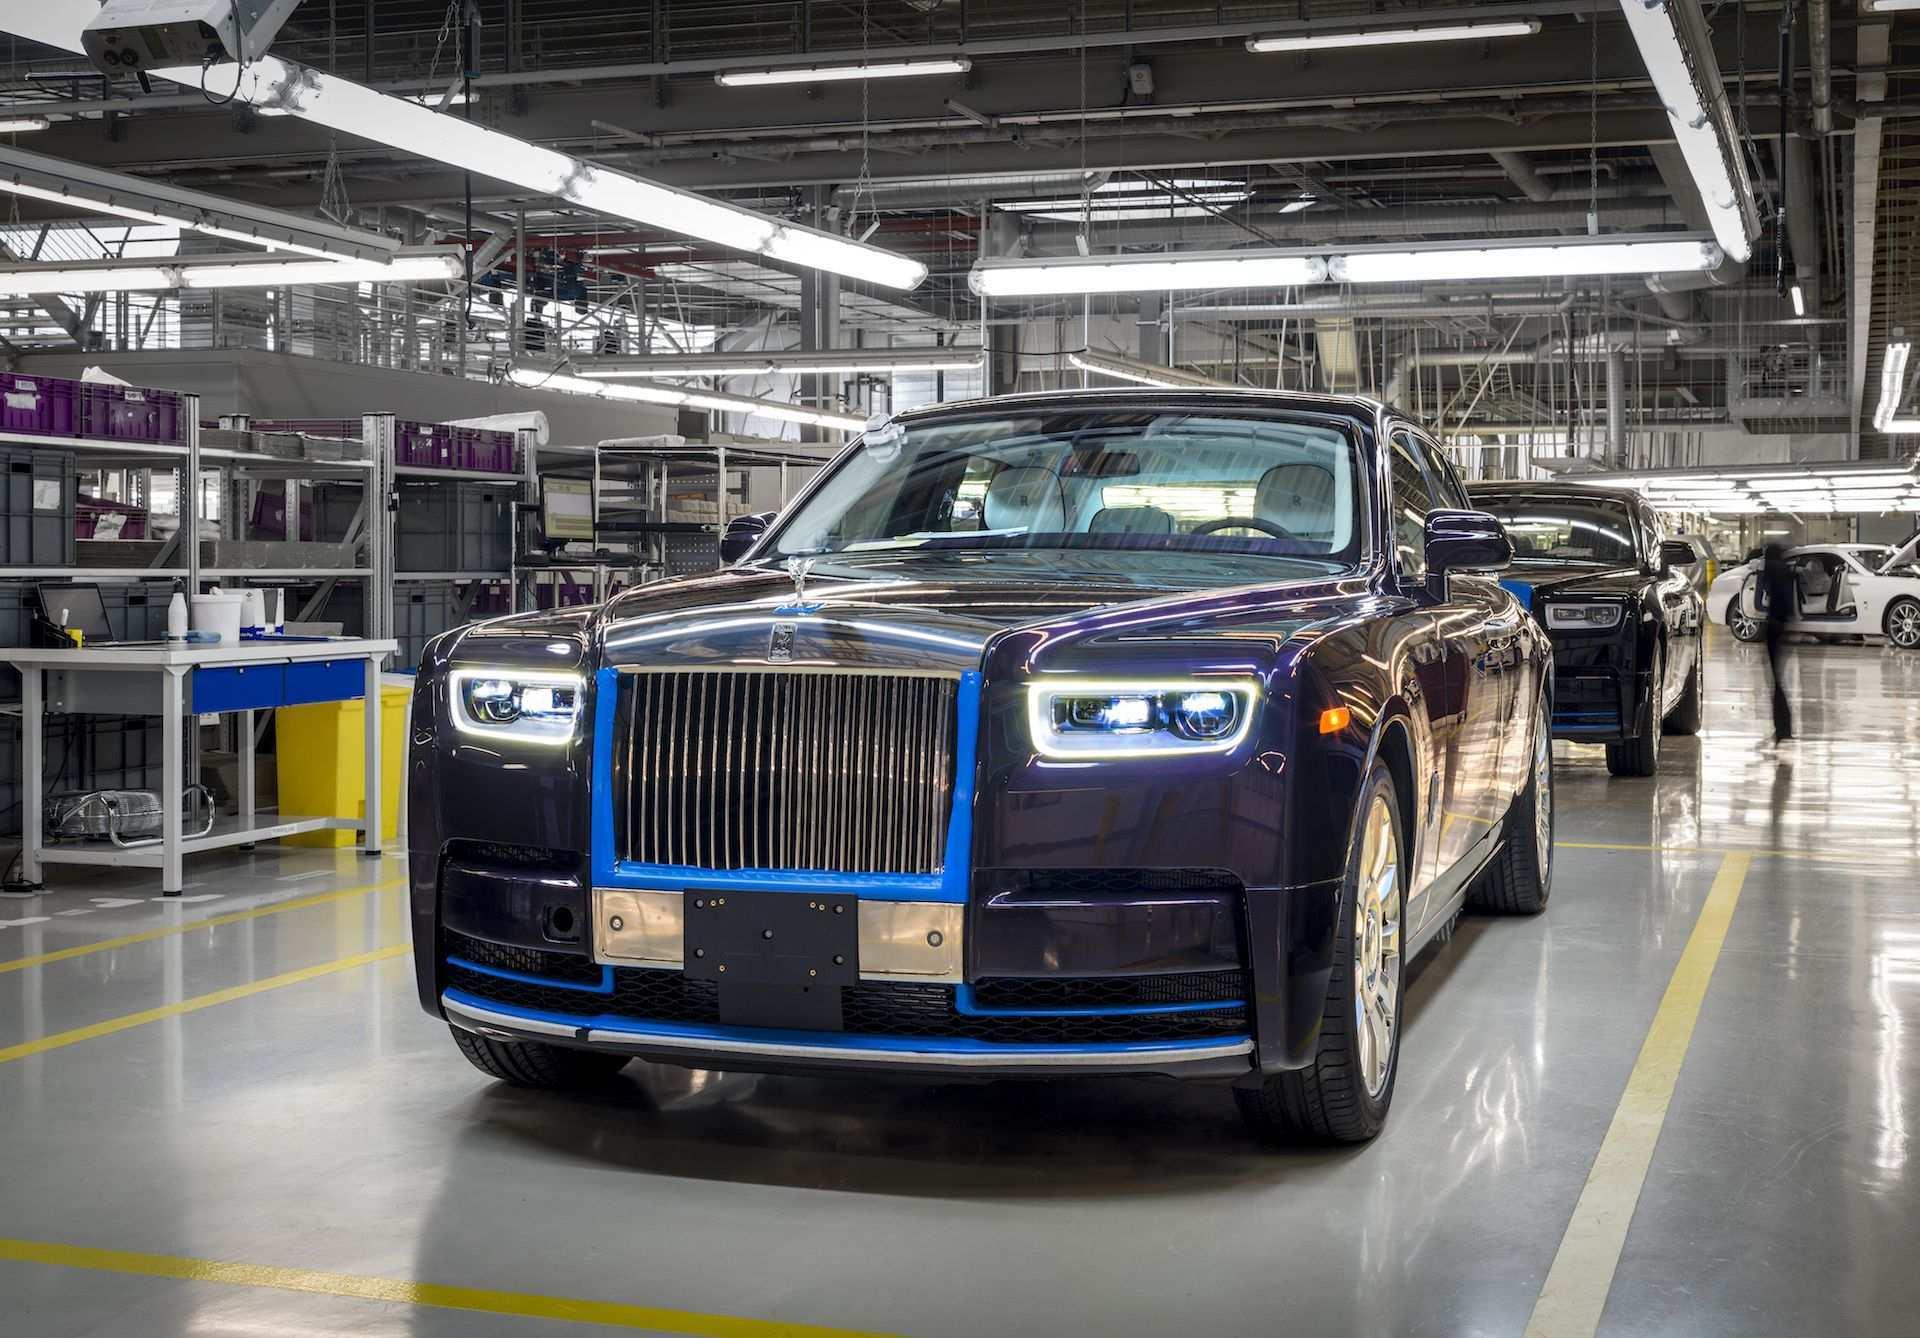 57 All New 2020 Rolls Royce Phantoms Redesign with 2020 Rolls Royce Phantoms